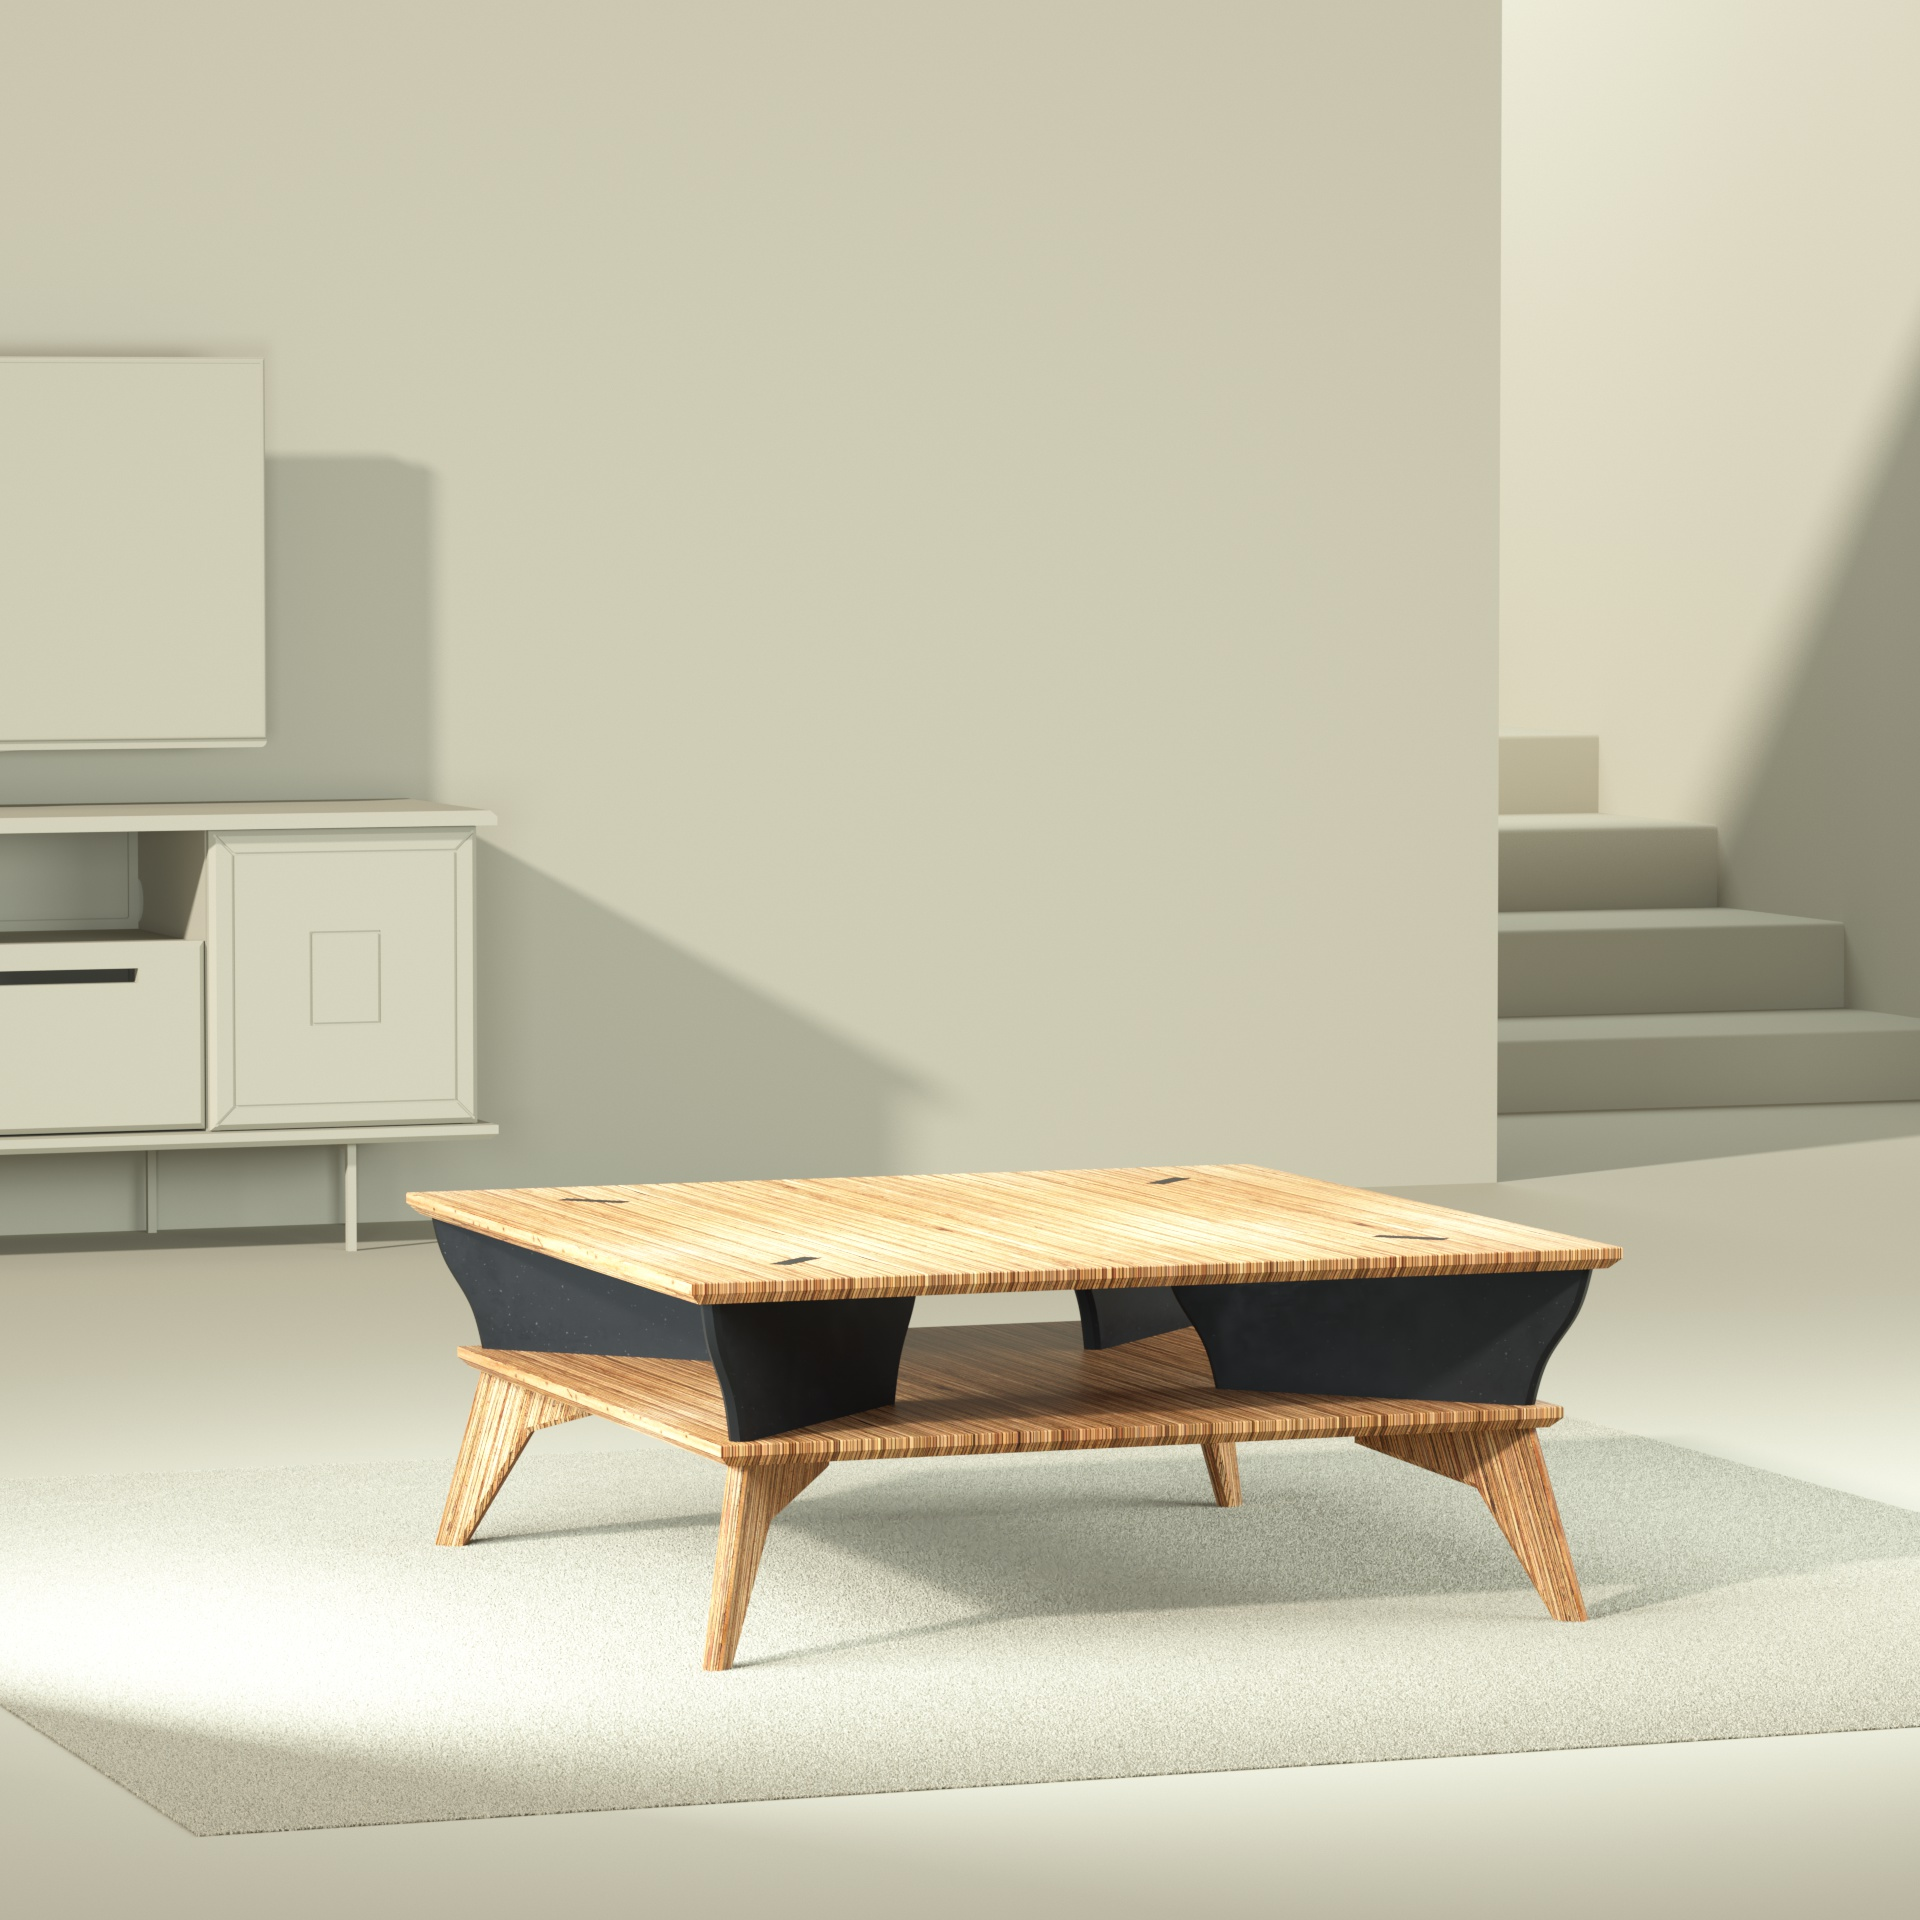 Yvette_table_basse_design_made_in_france_90_par_90_cm